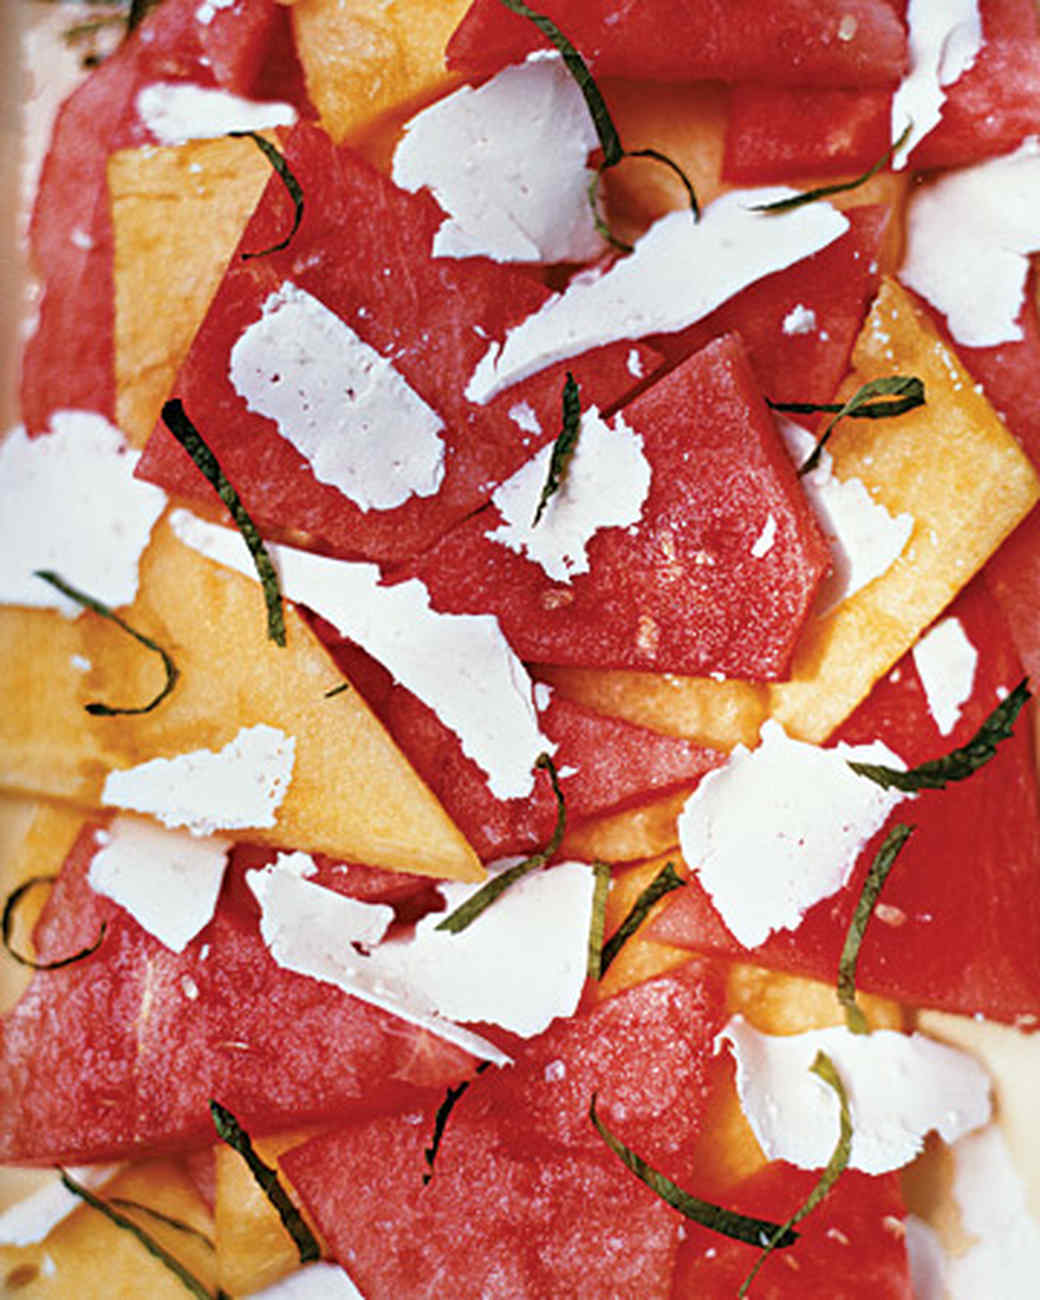 mla103437_0708_watermelon.jpg